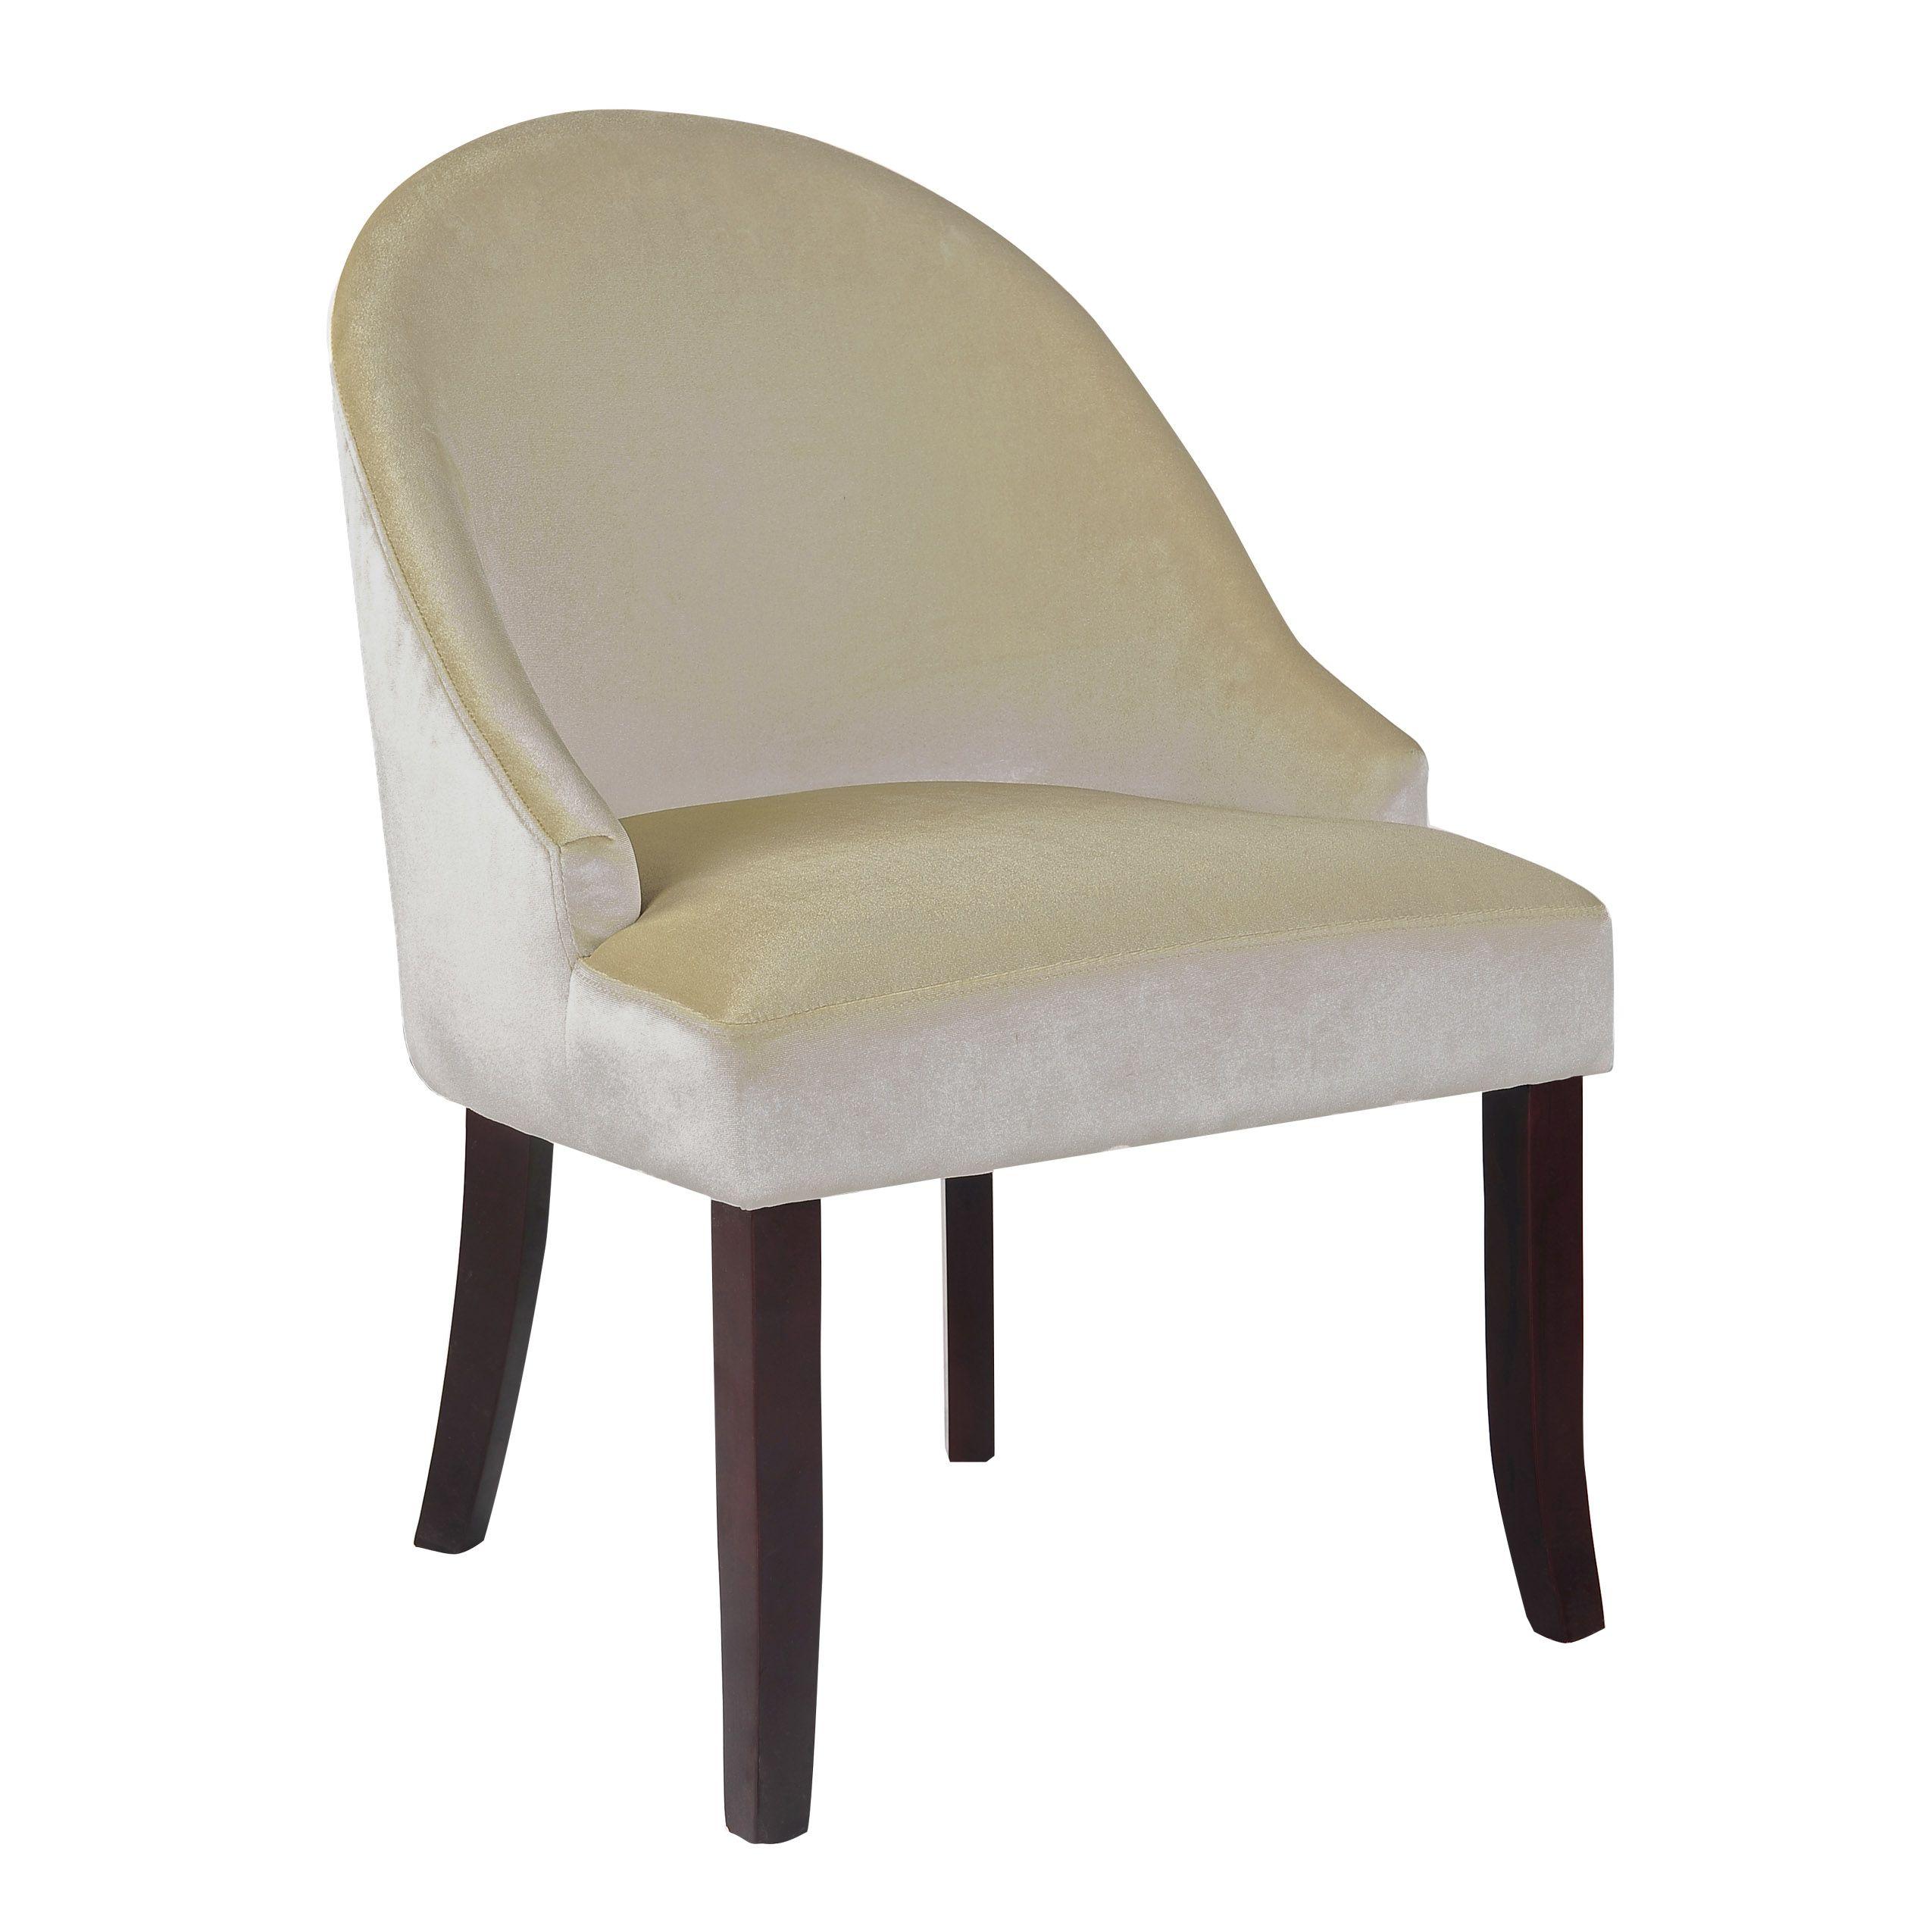 CorLiving Antonio Accent Chair in Velvet, Multiple colors, Black ...